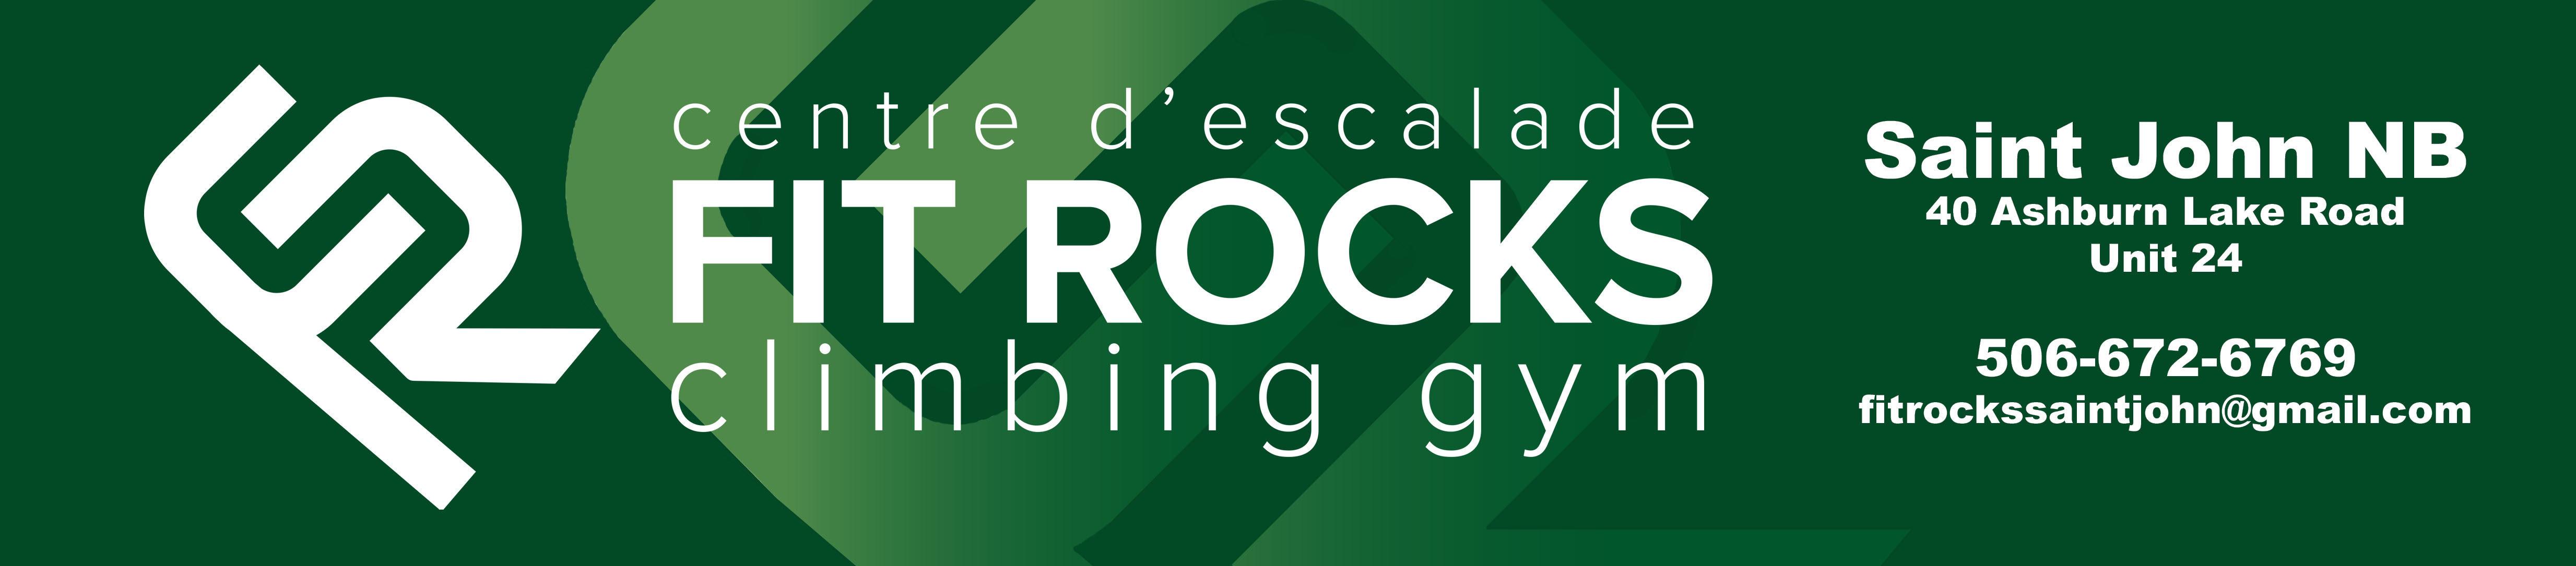 FitRocks Climbing Gyms – Saint John NB